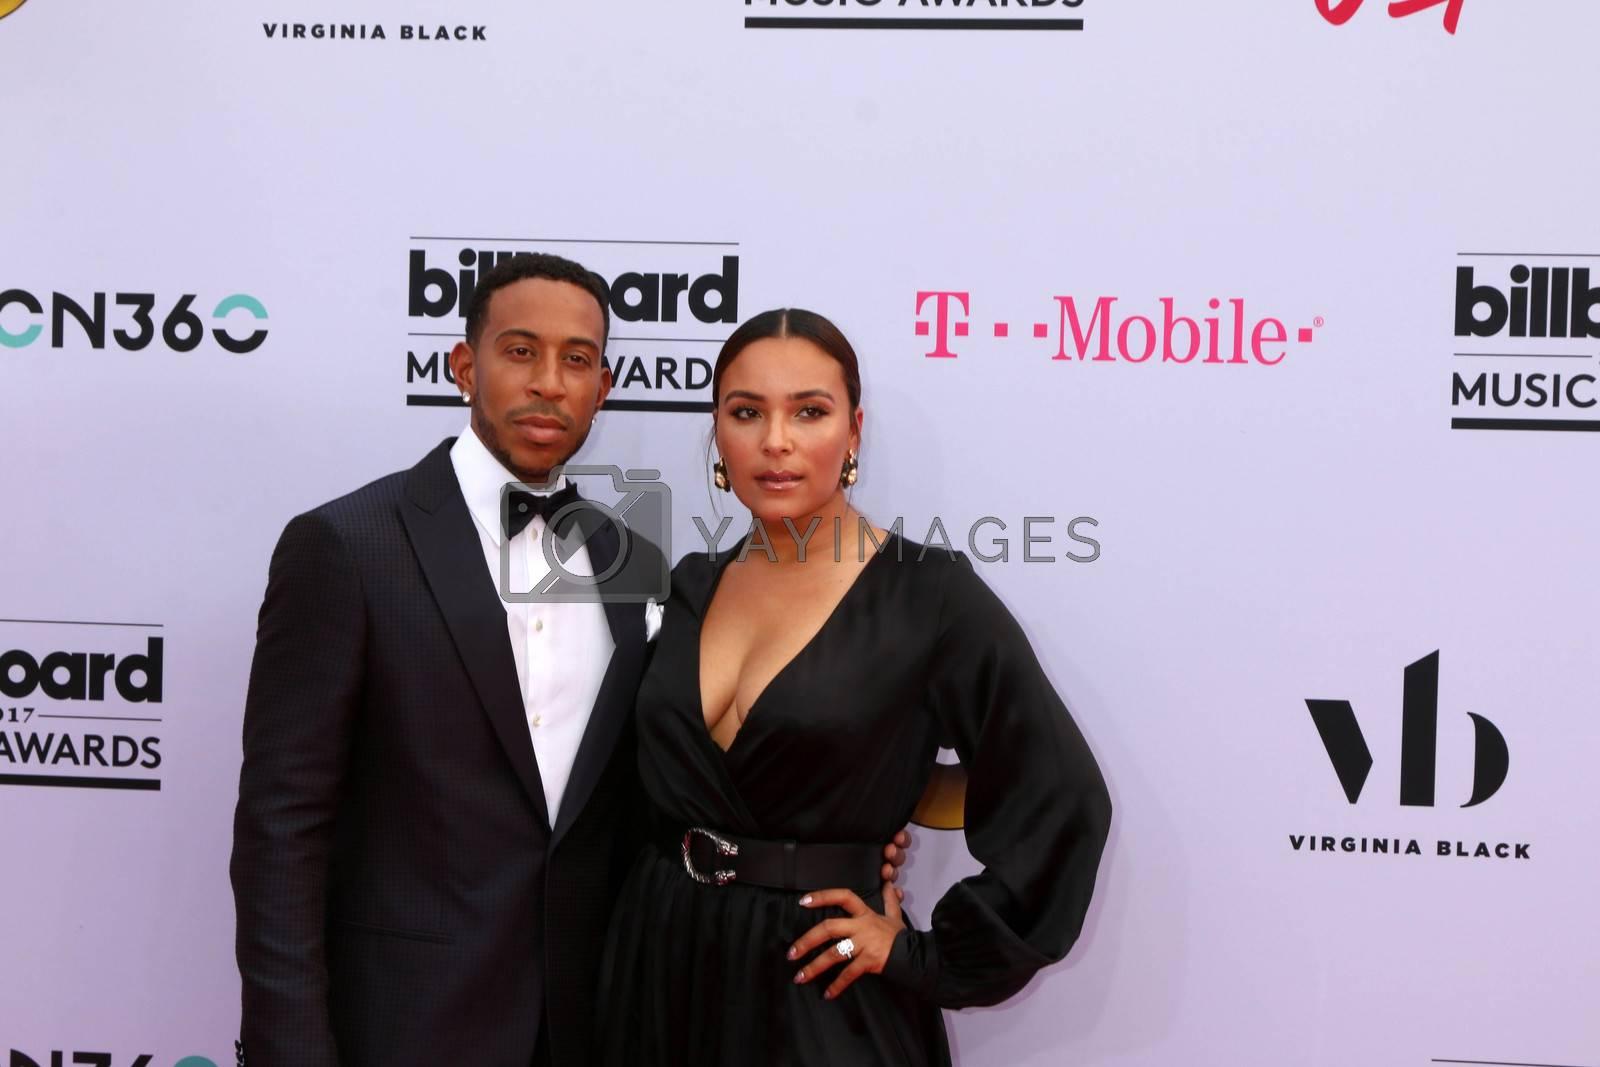 Chris Bridges, Ludacris, Eudoxie Mbouguiengue at the 2017 Billboard Awards Arrivals, T-Mobile Arena, Las Vegas, NV 05-21-17